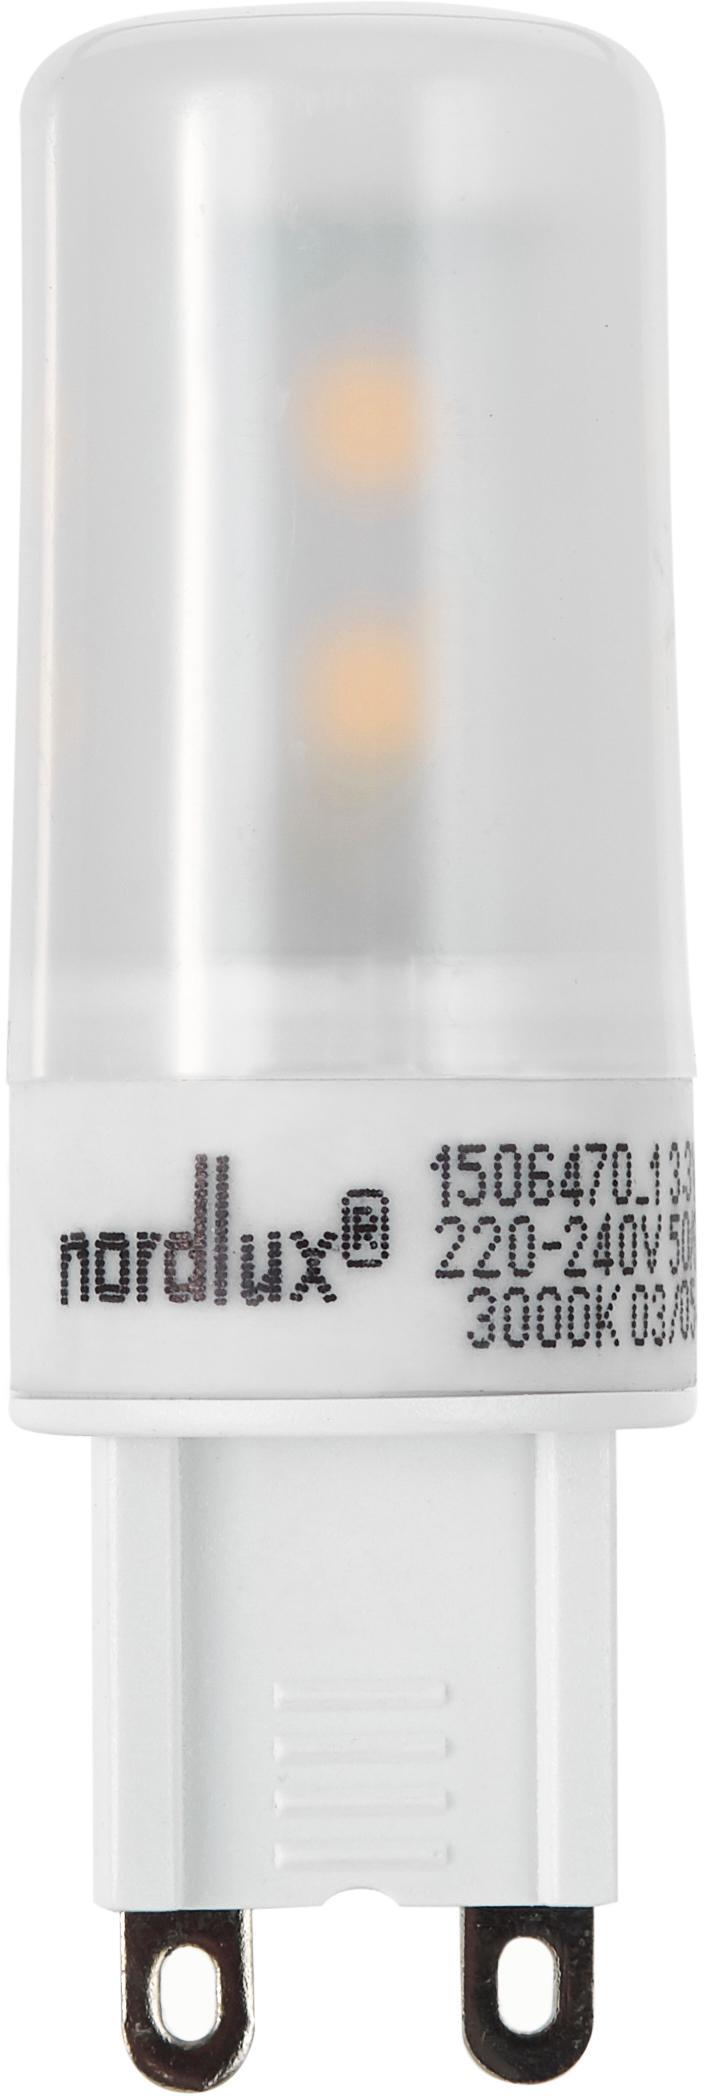 LED Leuchtmittel Gabriel (G9/3.3W), 5 Stück, Leuchtmittelschirm: Kunststoff, Leuchtmittelfassung: Aluminium, Transparent, Ø 2 x H 6 cm